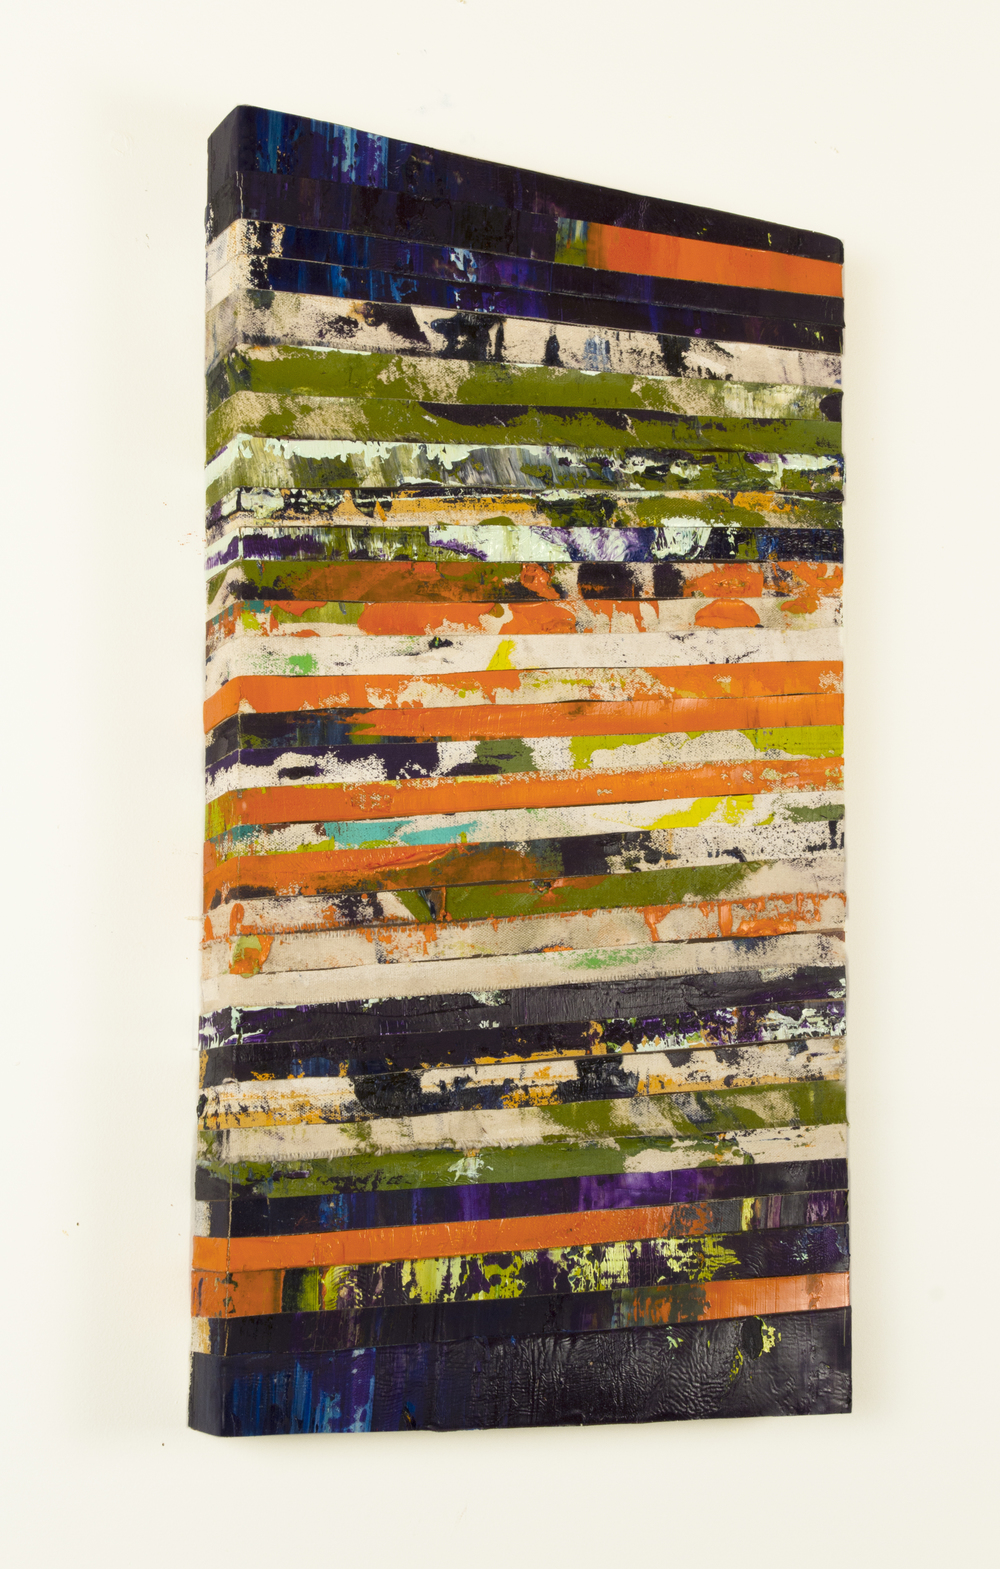 askew, 2015, oil on canvasstrips, 11.5 x 21.5